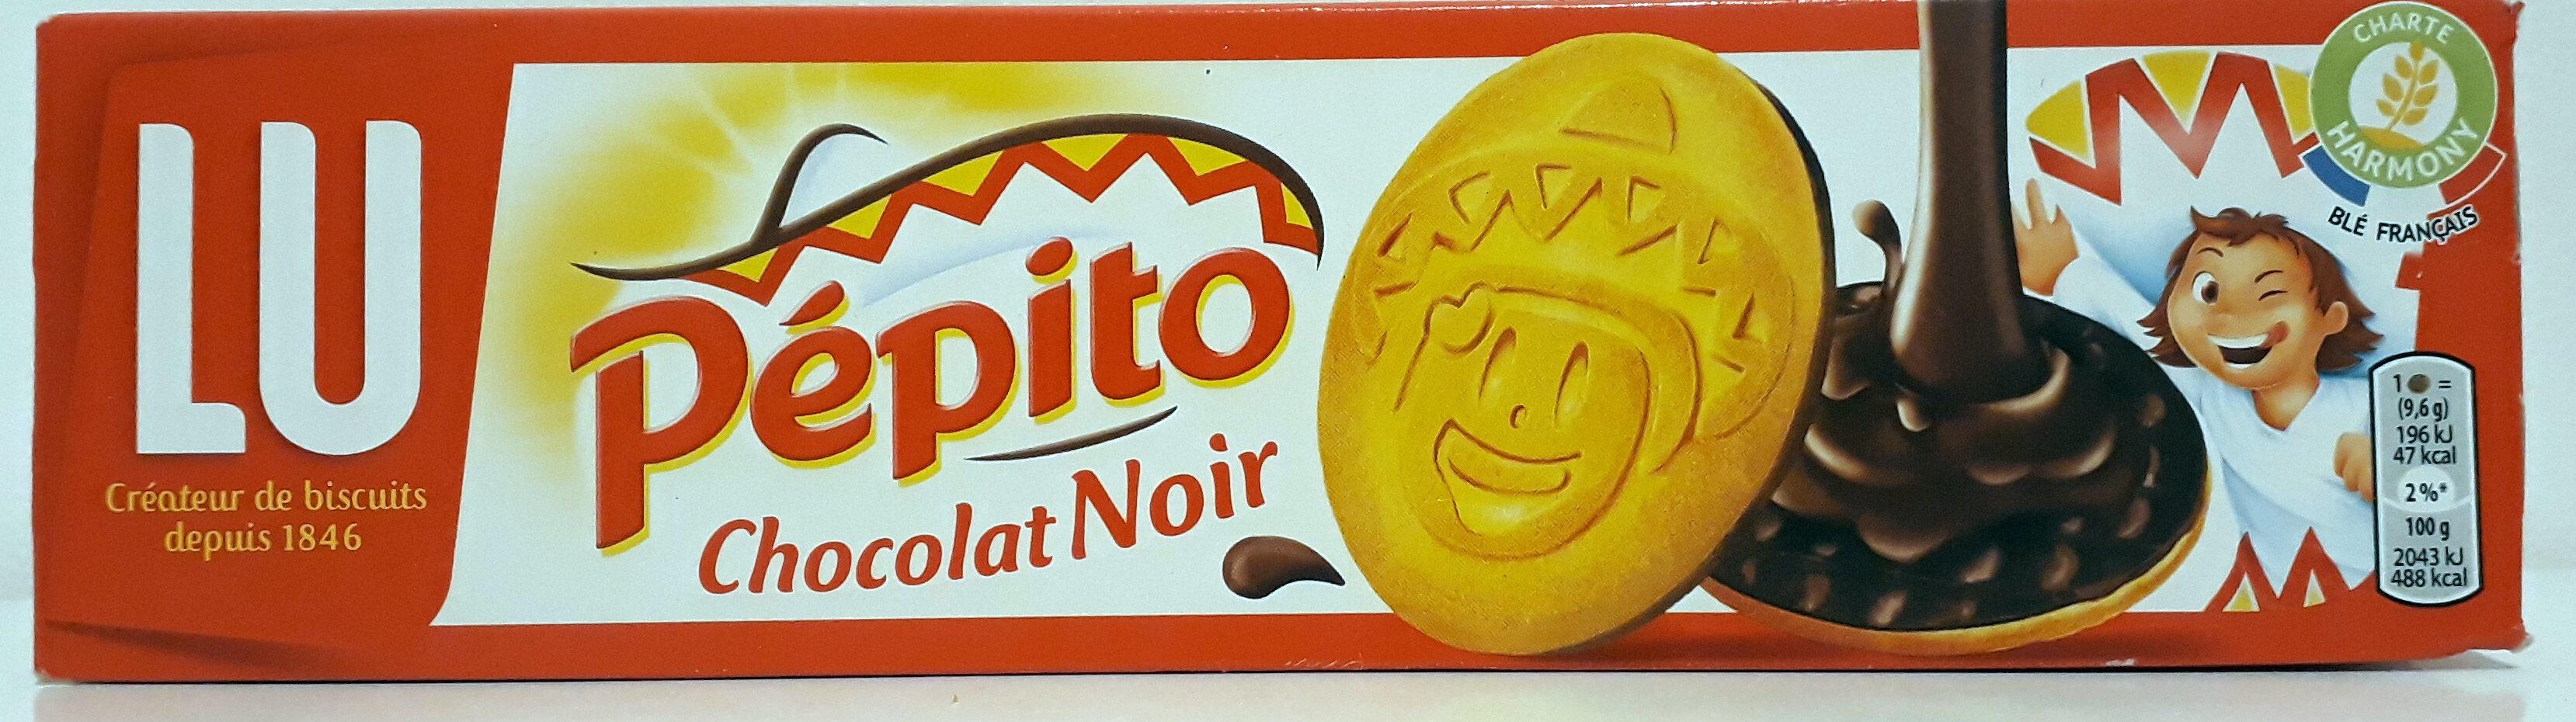 Pépito - Chocolat noir - Produit - fr